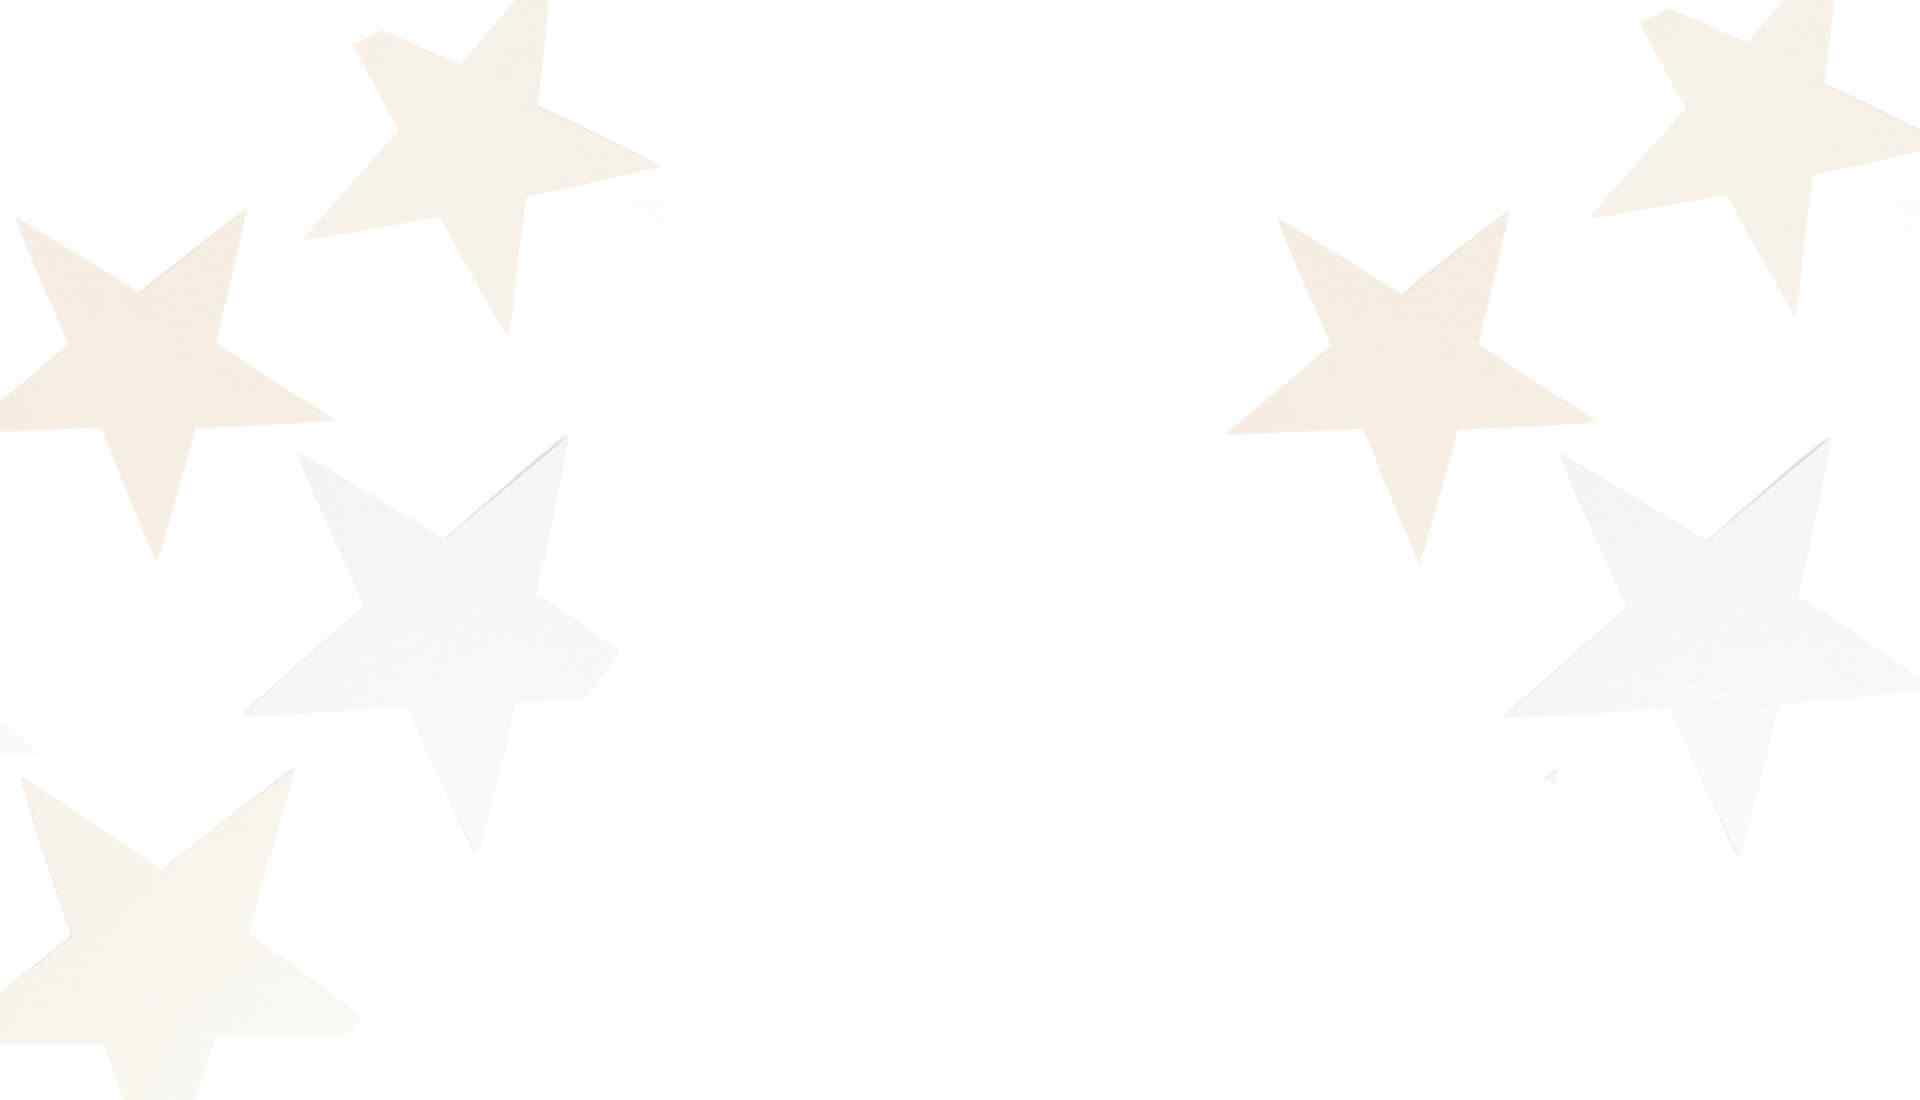 https://www.musikschule-heiligenhaus.de/wp-content/uploads/2019/05/footer_background_stars.jpg